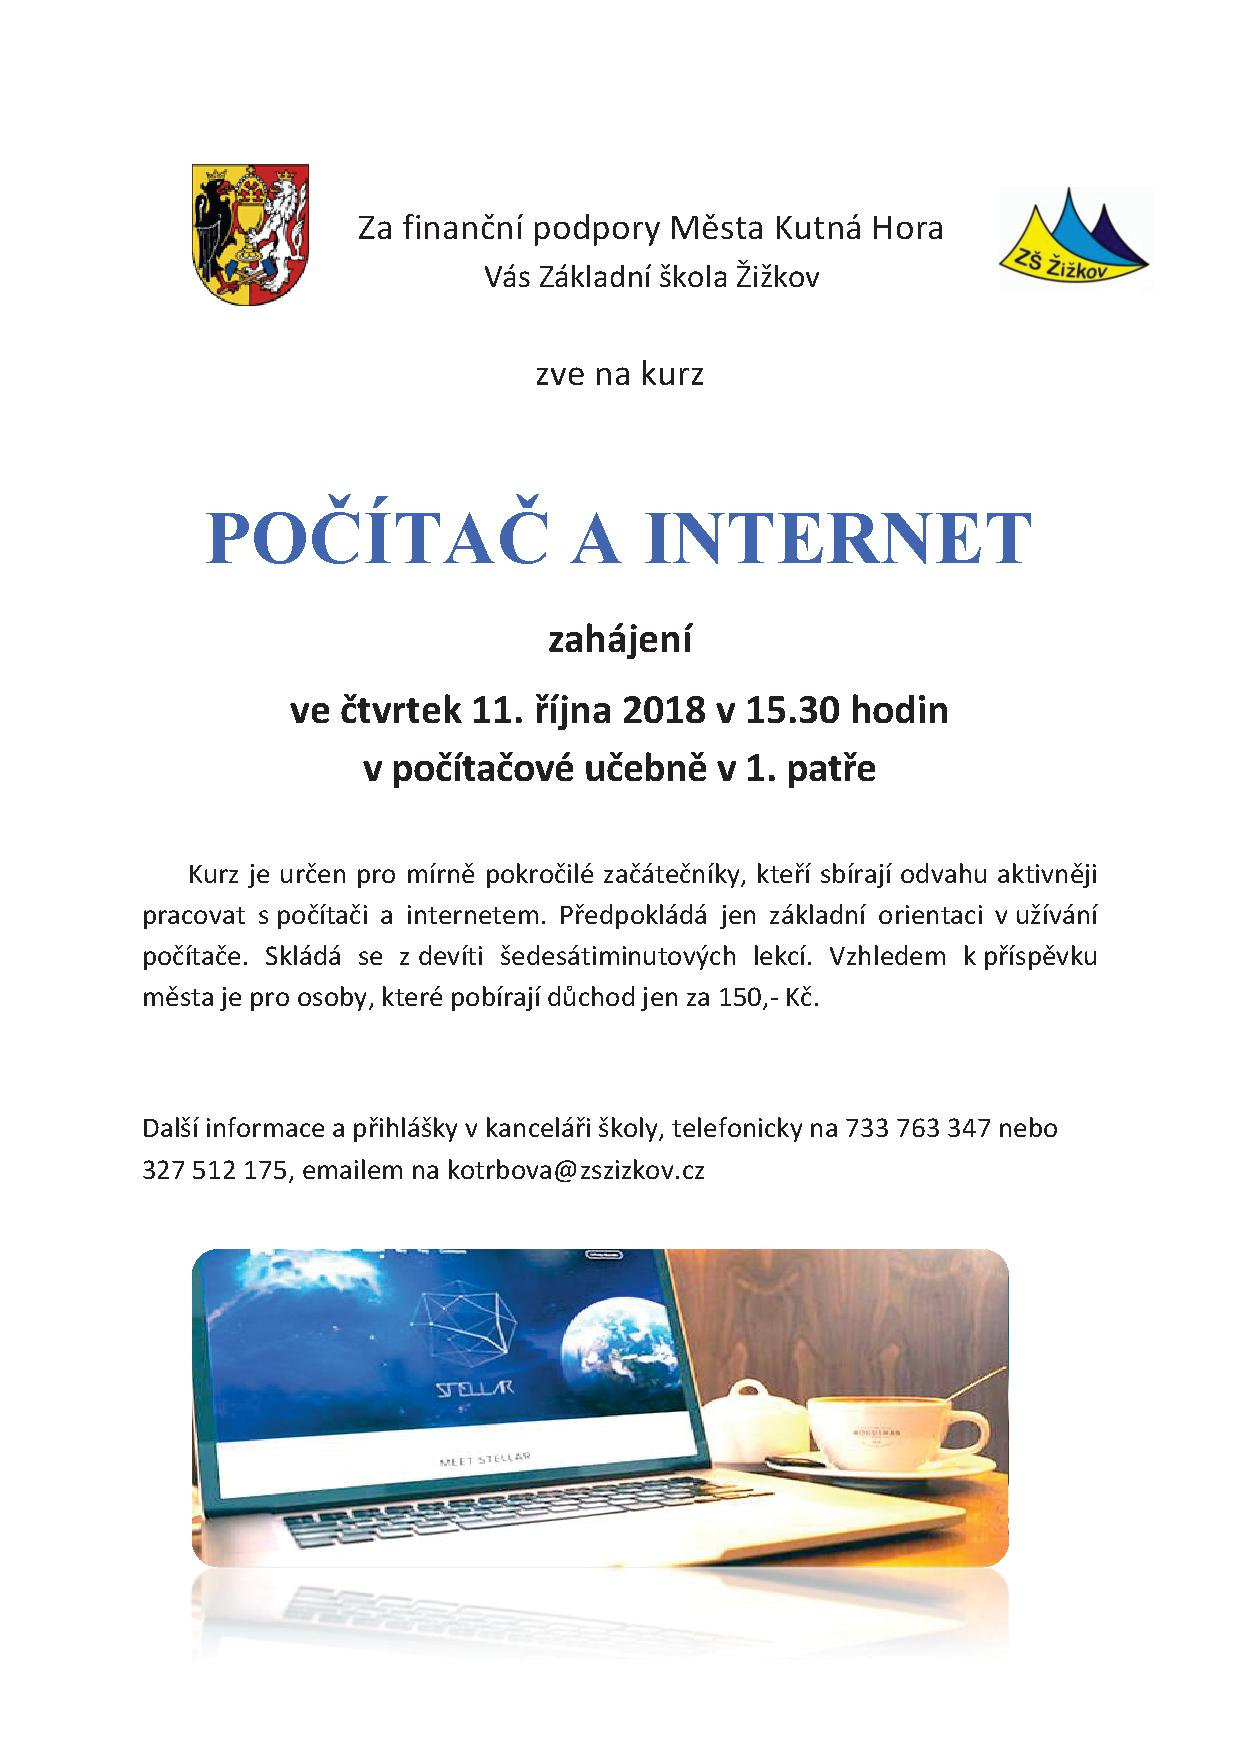 4539-pc-a-internet.jpg